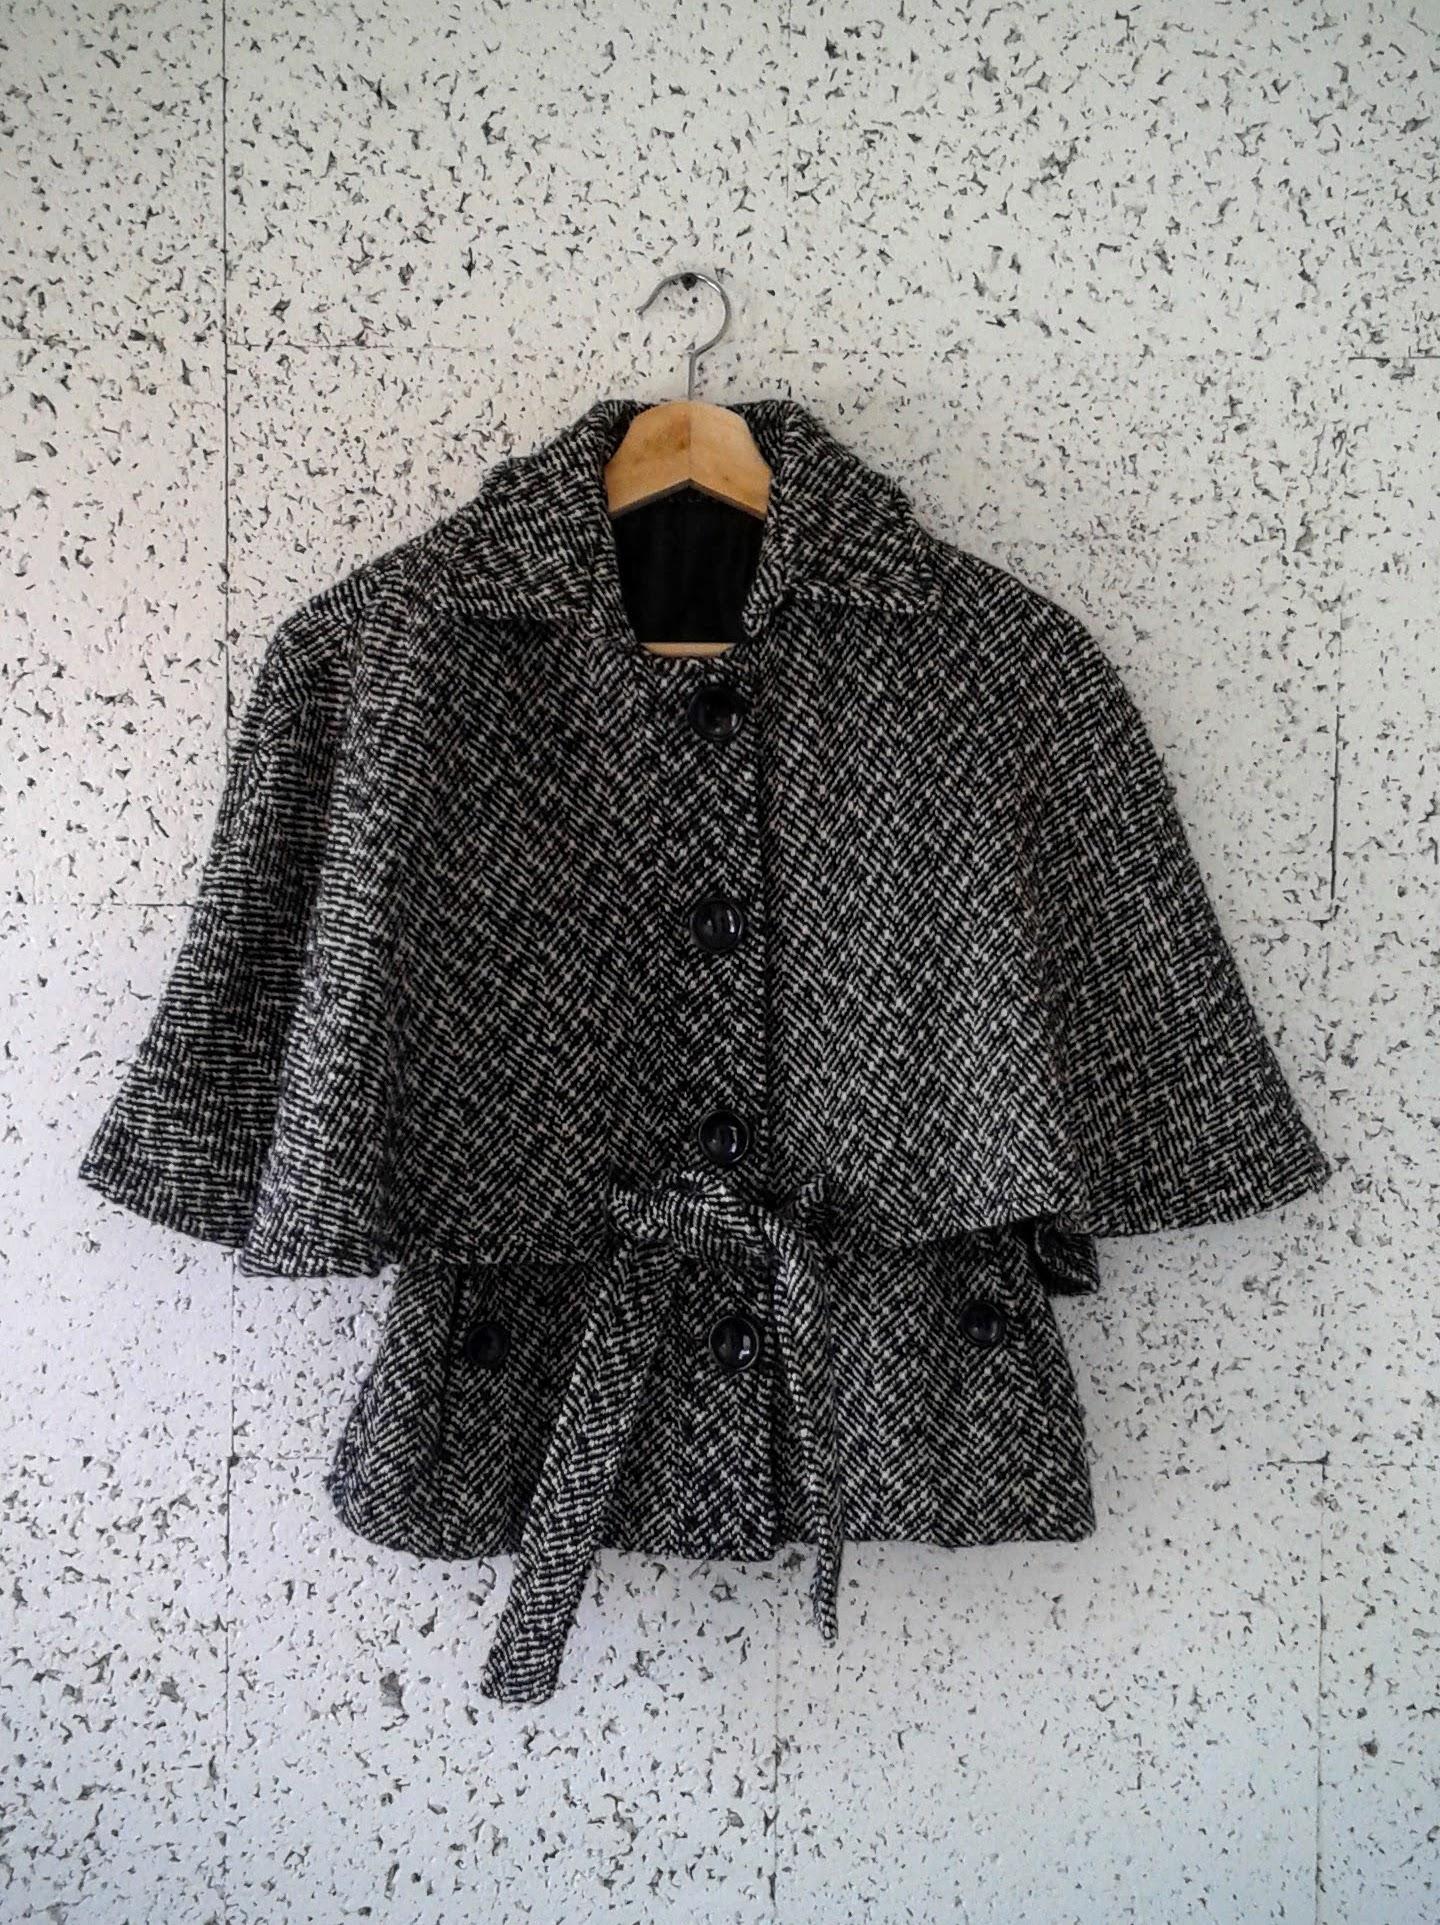 Mystic cape coat; Size S, $40